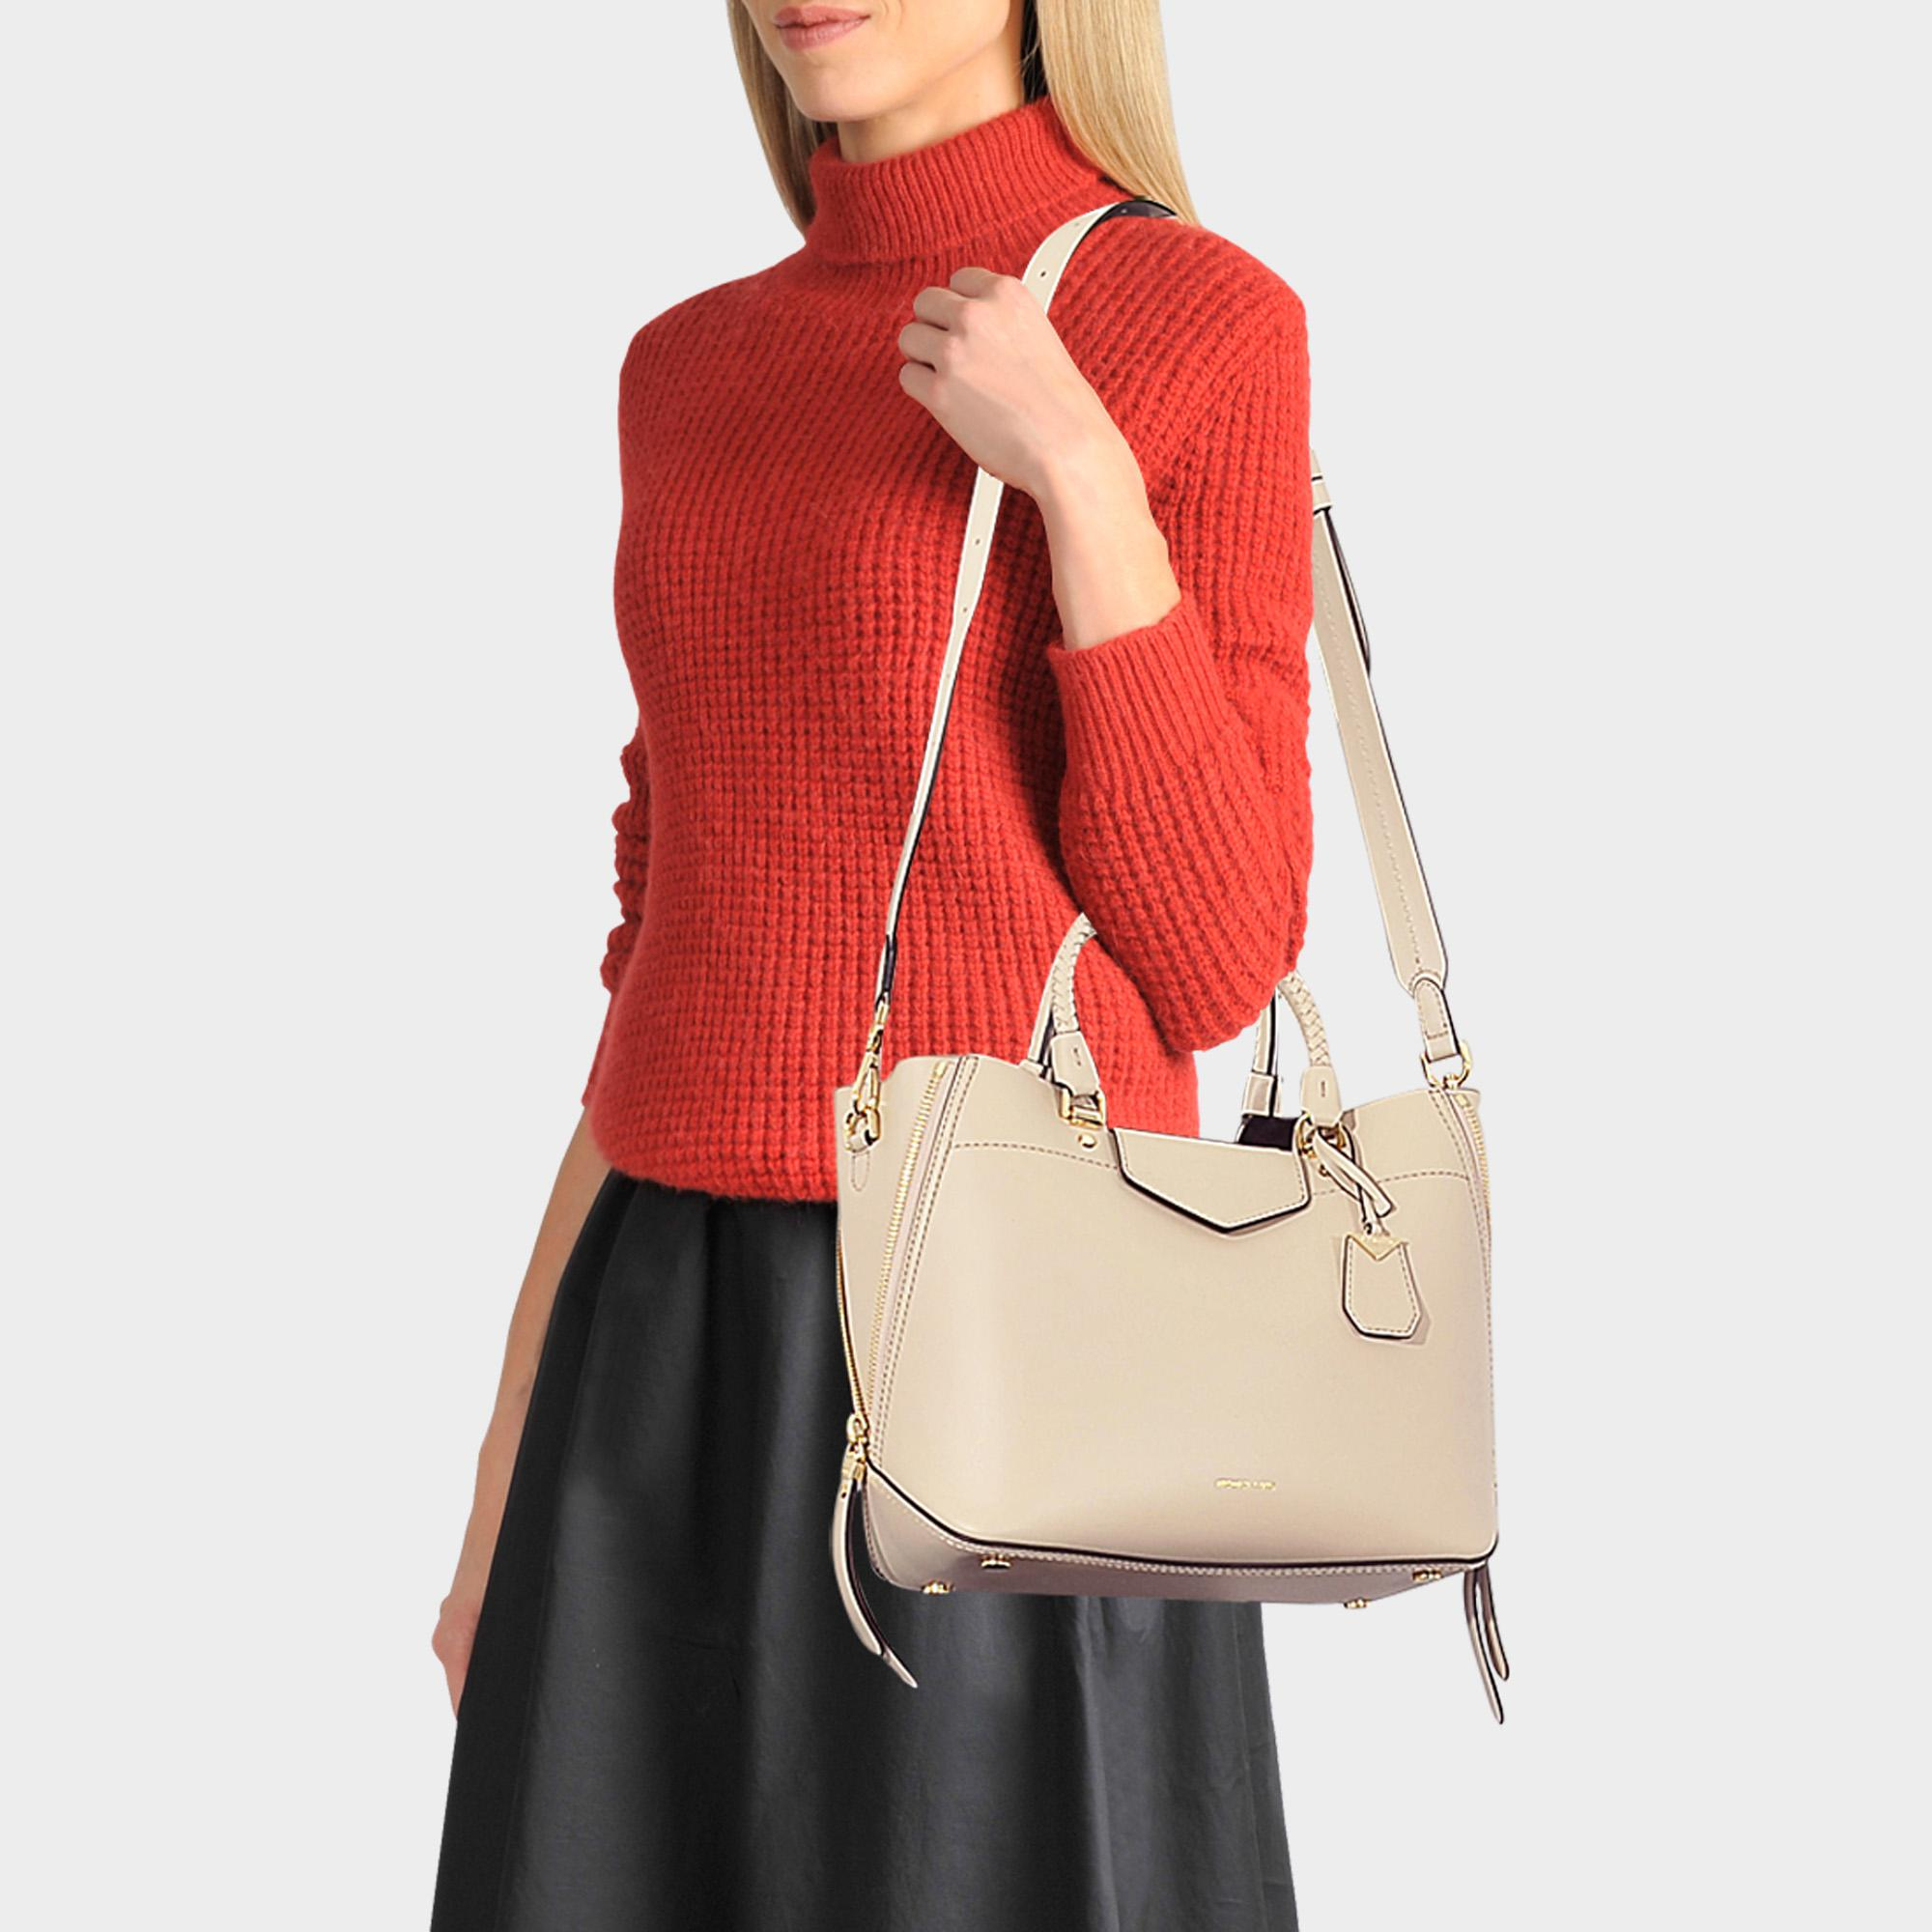 40a83b5e0676 MICHAEL Michael Kors Blakely Medium Tote Bag In Oat Viola Leather - Lyst